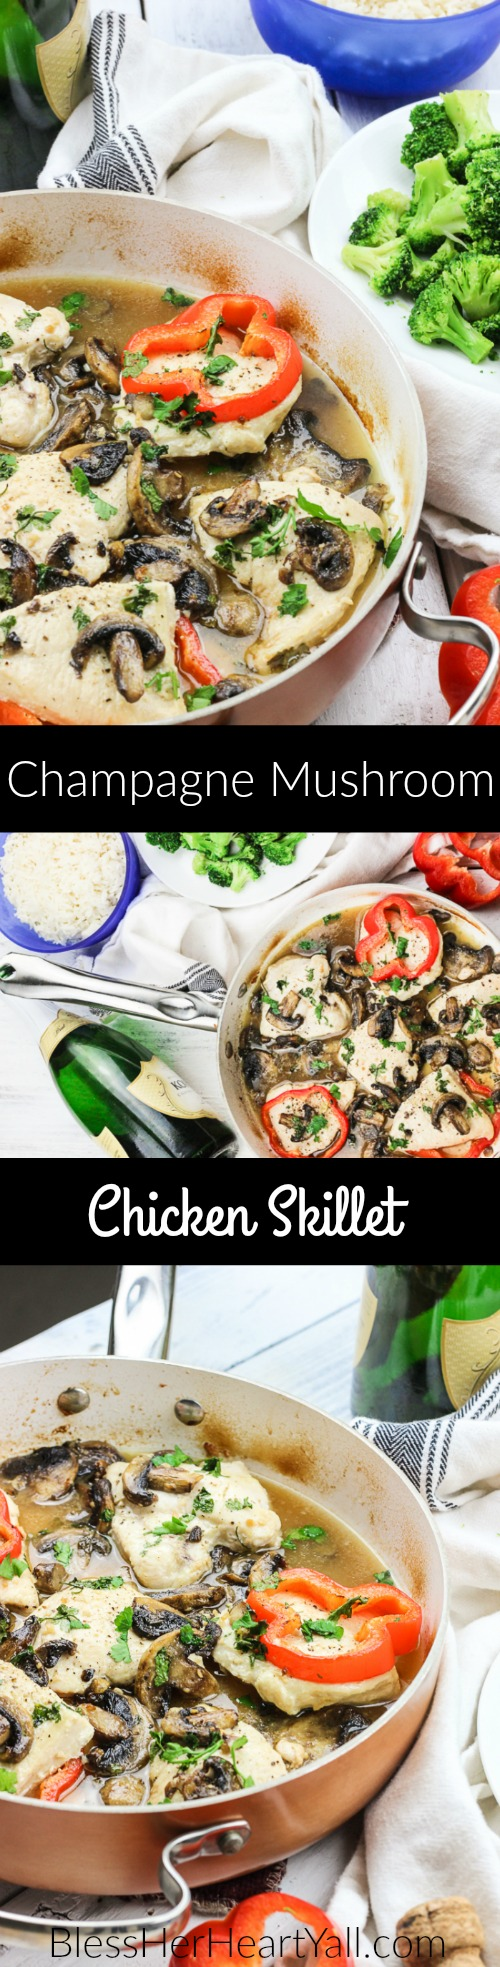 champagne mushroom chicken long pin 3